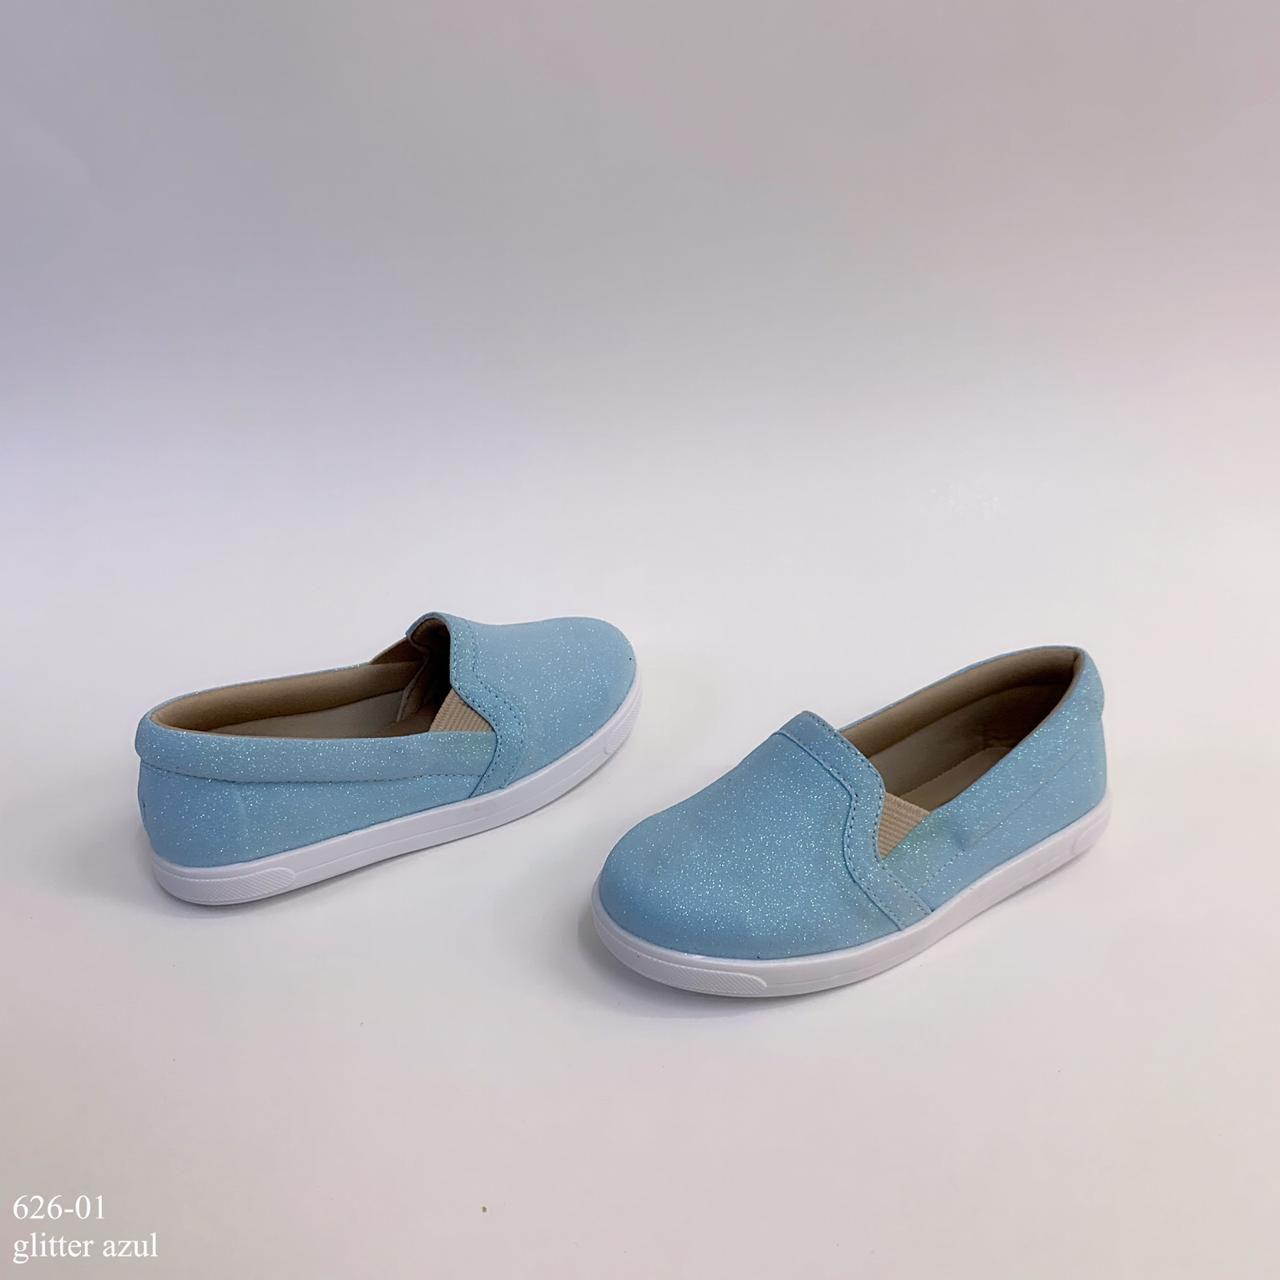 Tênis Mamãe & Filha Azul Glitter | D-626-01